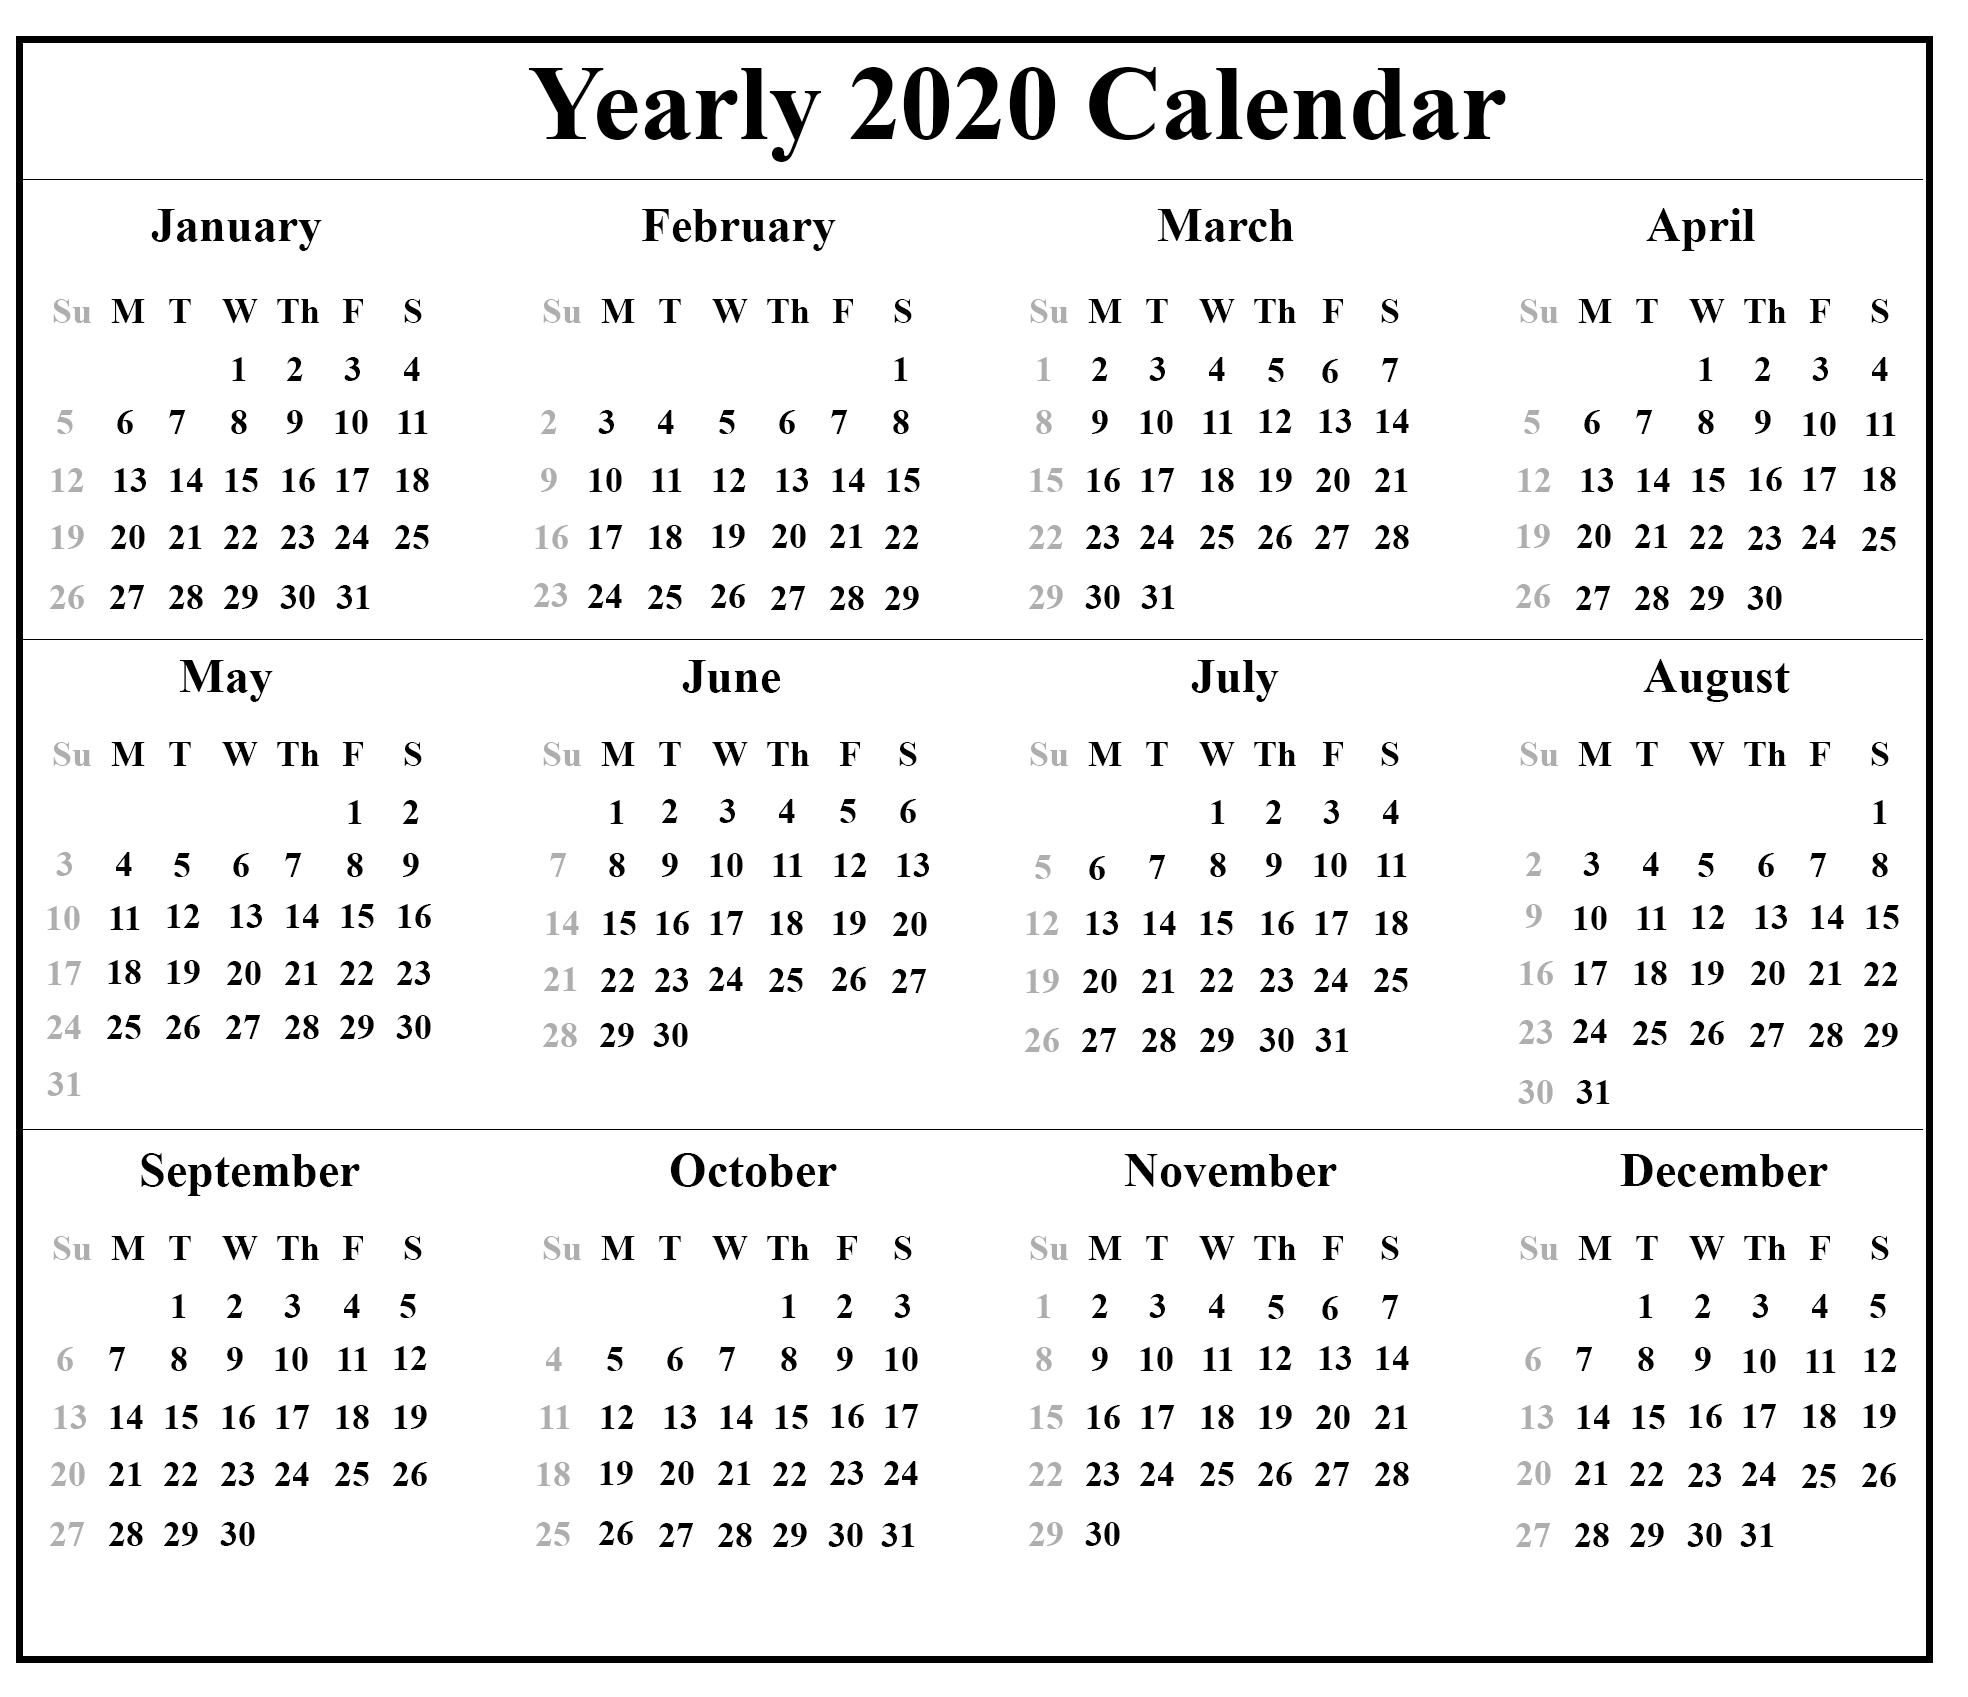 Printable January Calendar Template-January 2020 Calendar With Holidays Sri Lanka